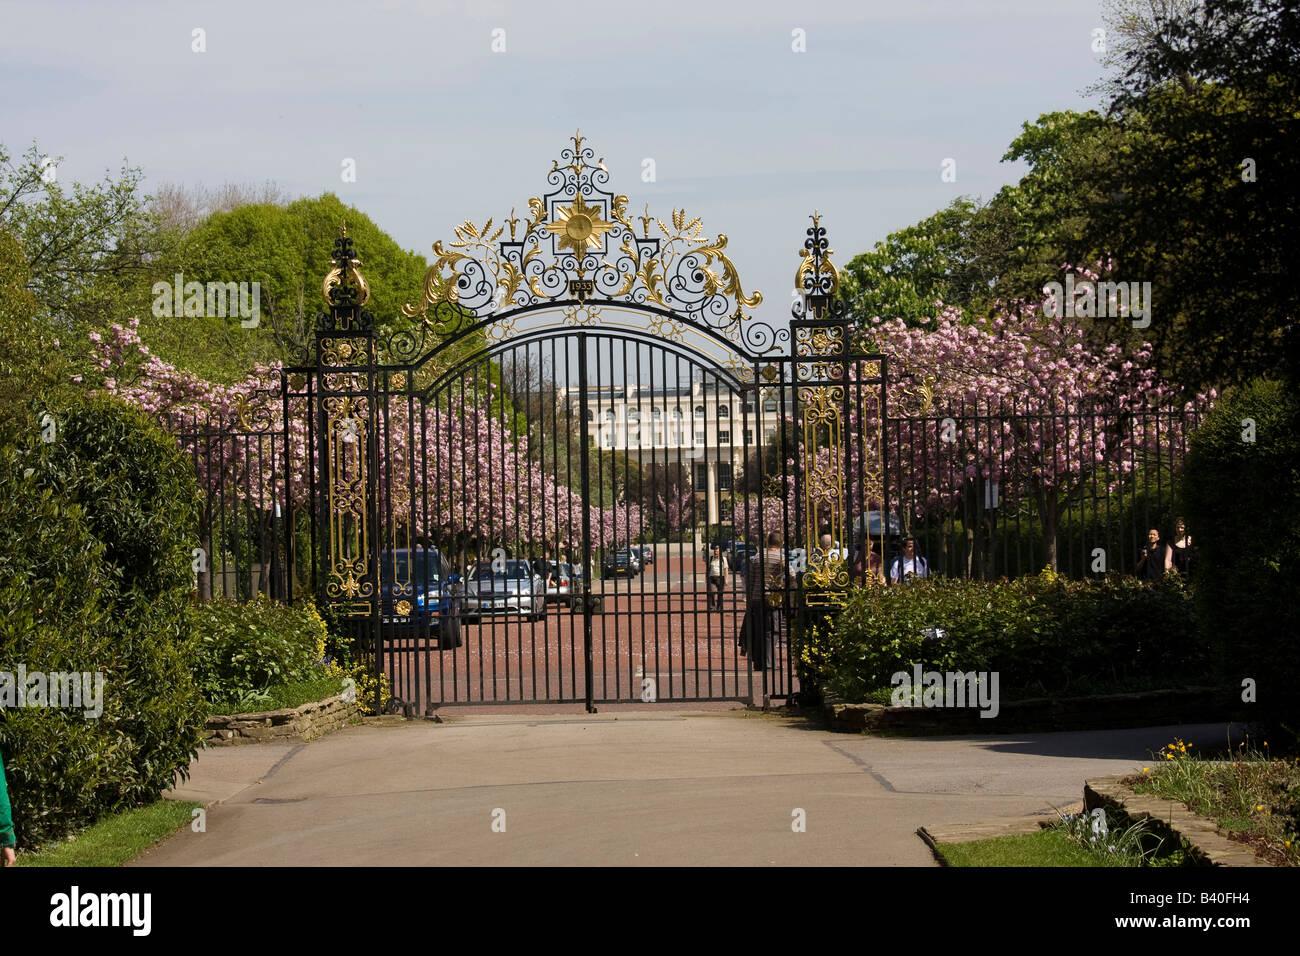 London Regents Park Gates wrought iron Stock Photo: 19681232 - Alamy